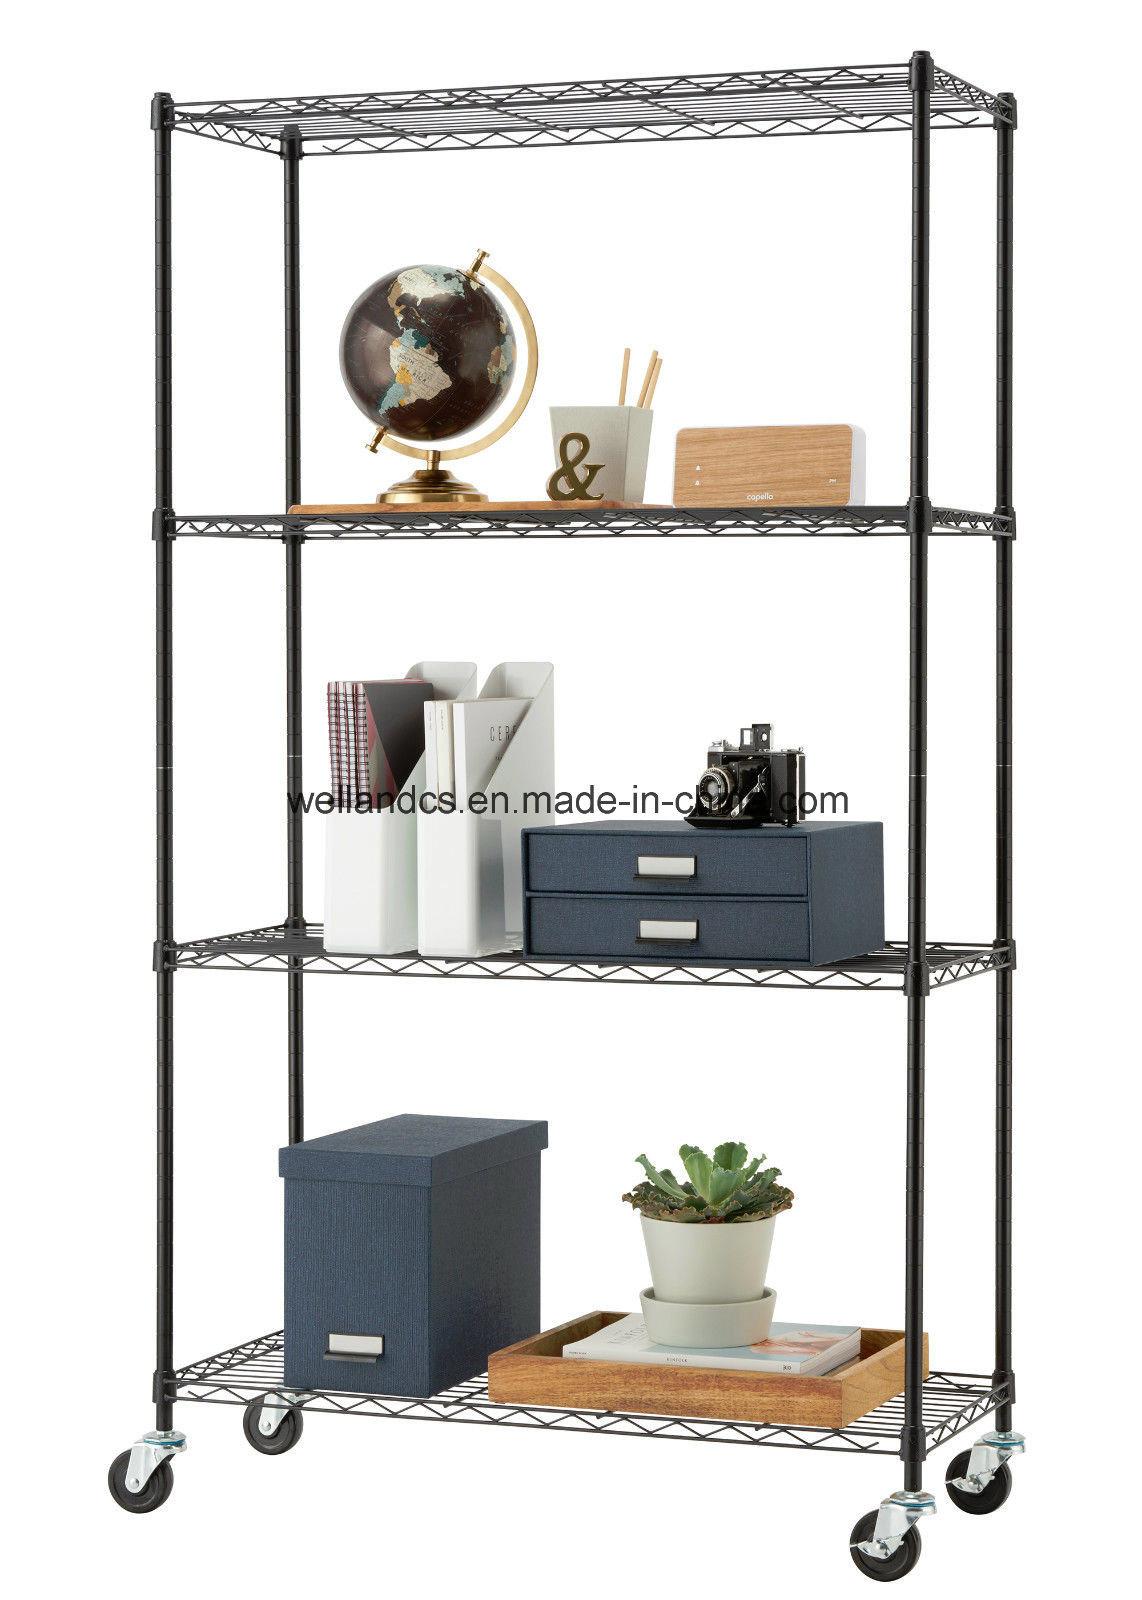 Hot Item Nsf 5 Tier Light Dty Decorative Wire Storage Rack Adjule Home Office Metal Shelf Display